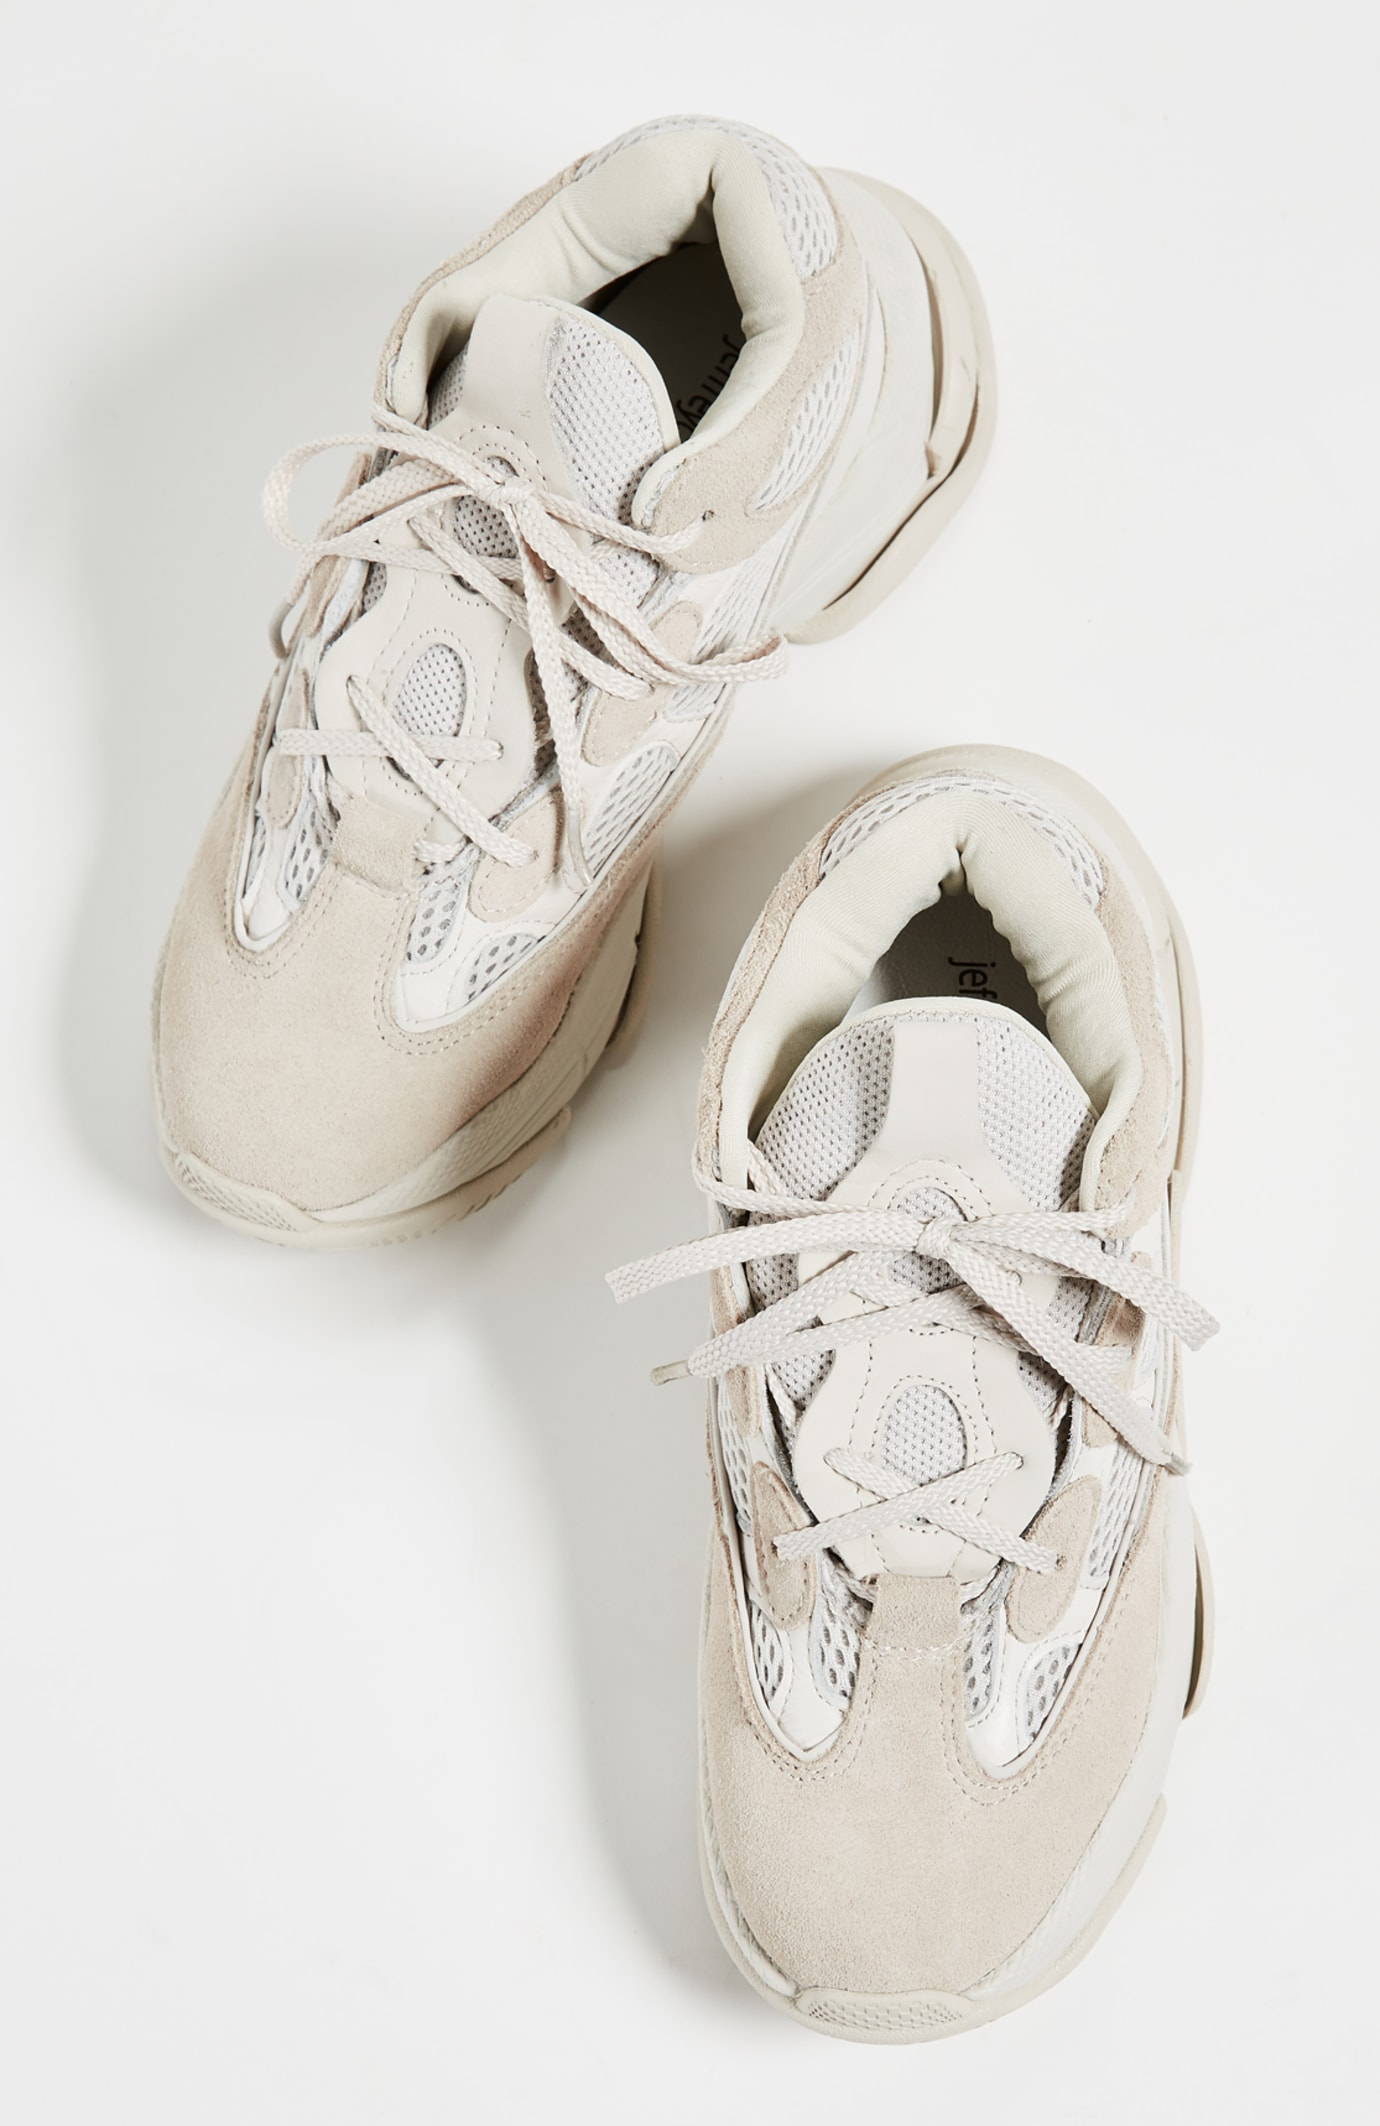 e446ee0edc87f0 Image via Shopbop Jeffery Campbell Hotline Dad Sneakers (Top)